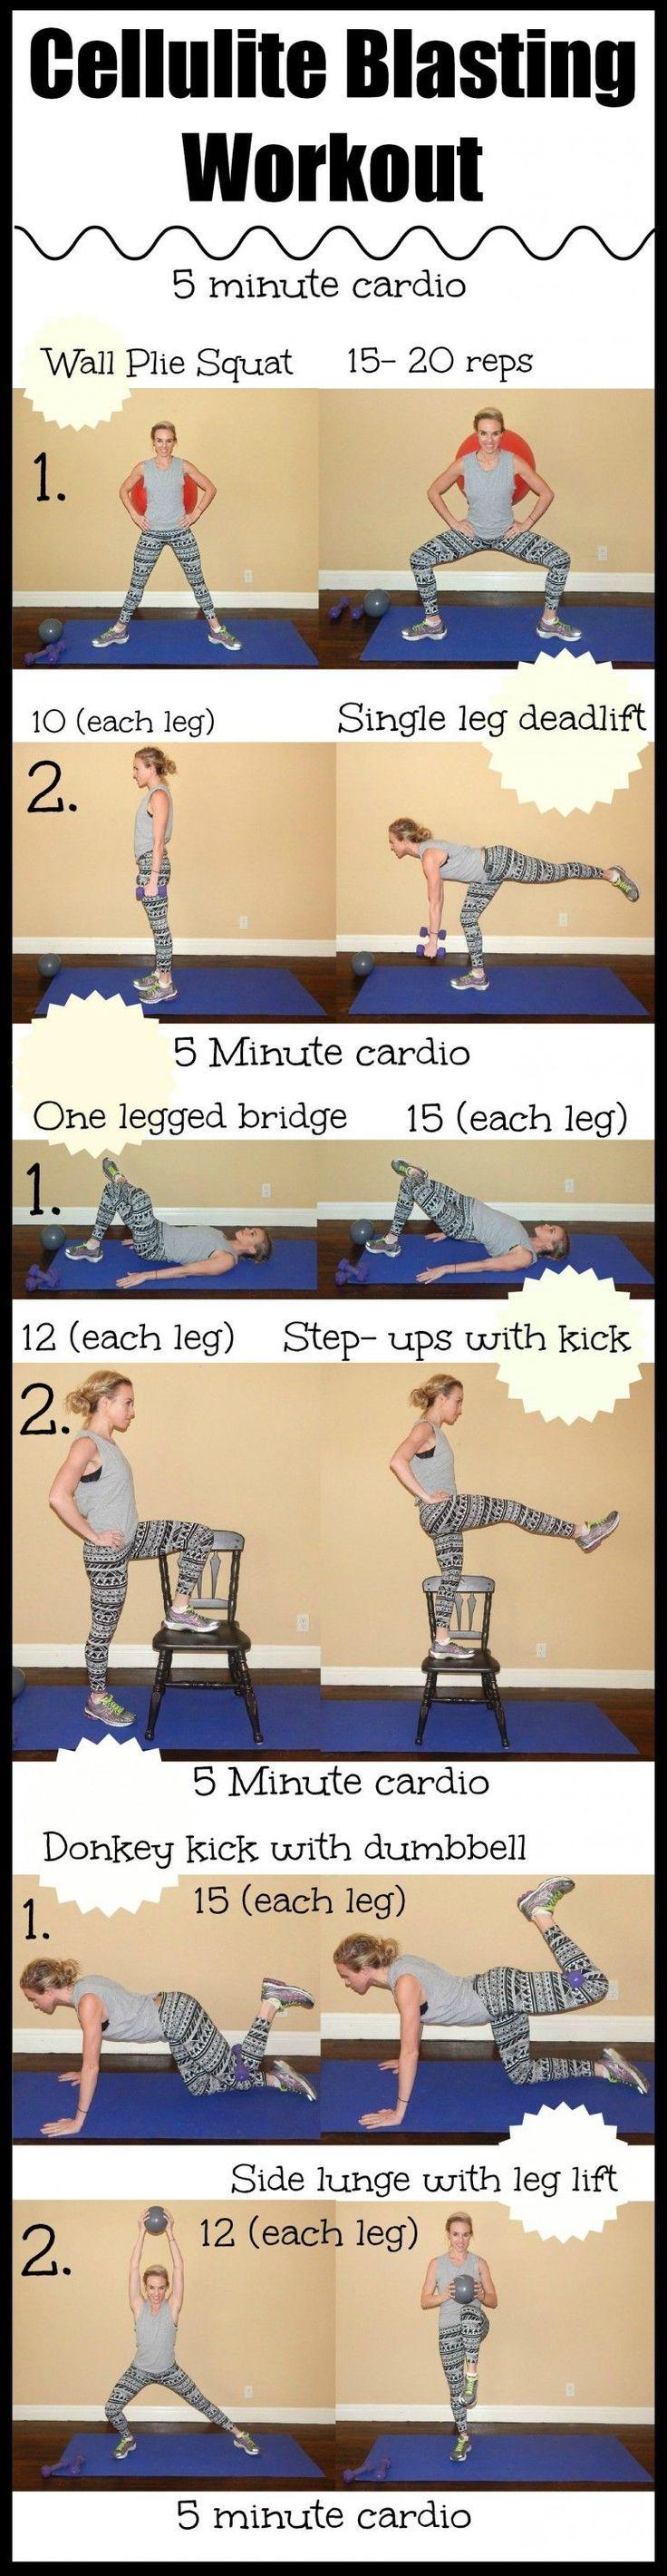 #womensworkout #workout #femalefitness cellulite workout thigh // cellulite workout get rid of // anti cellulite workout //cellulite workout plan // cellulite workout leg // eliminate cellulite workout // cellulite workout tips // lost cellulite workout // cellulite workout truths // cellulite workout health  // bye bye cellulite workout